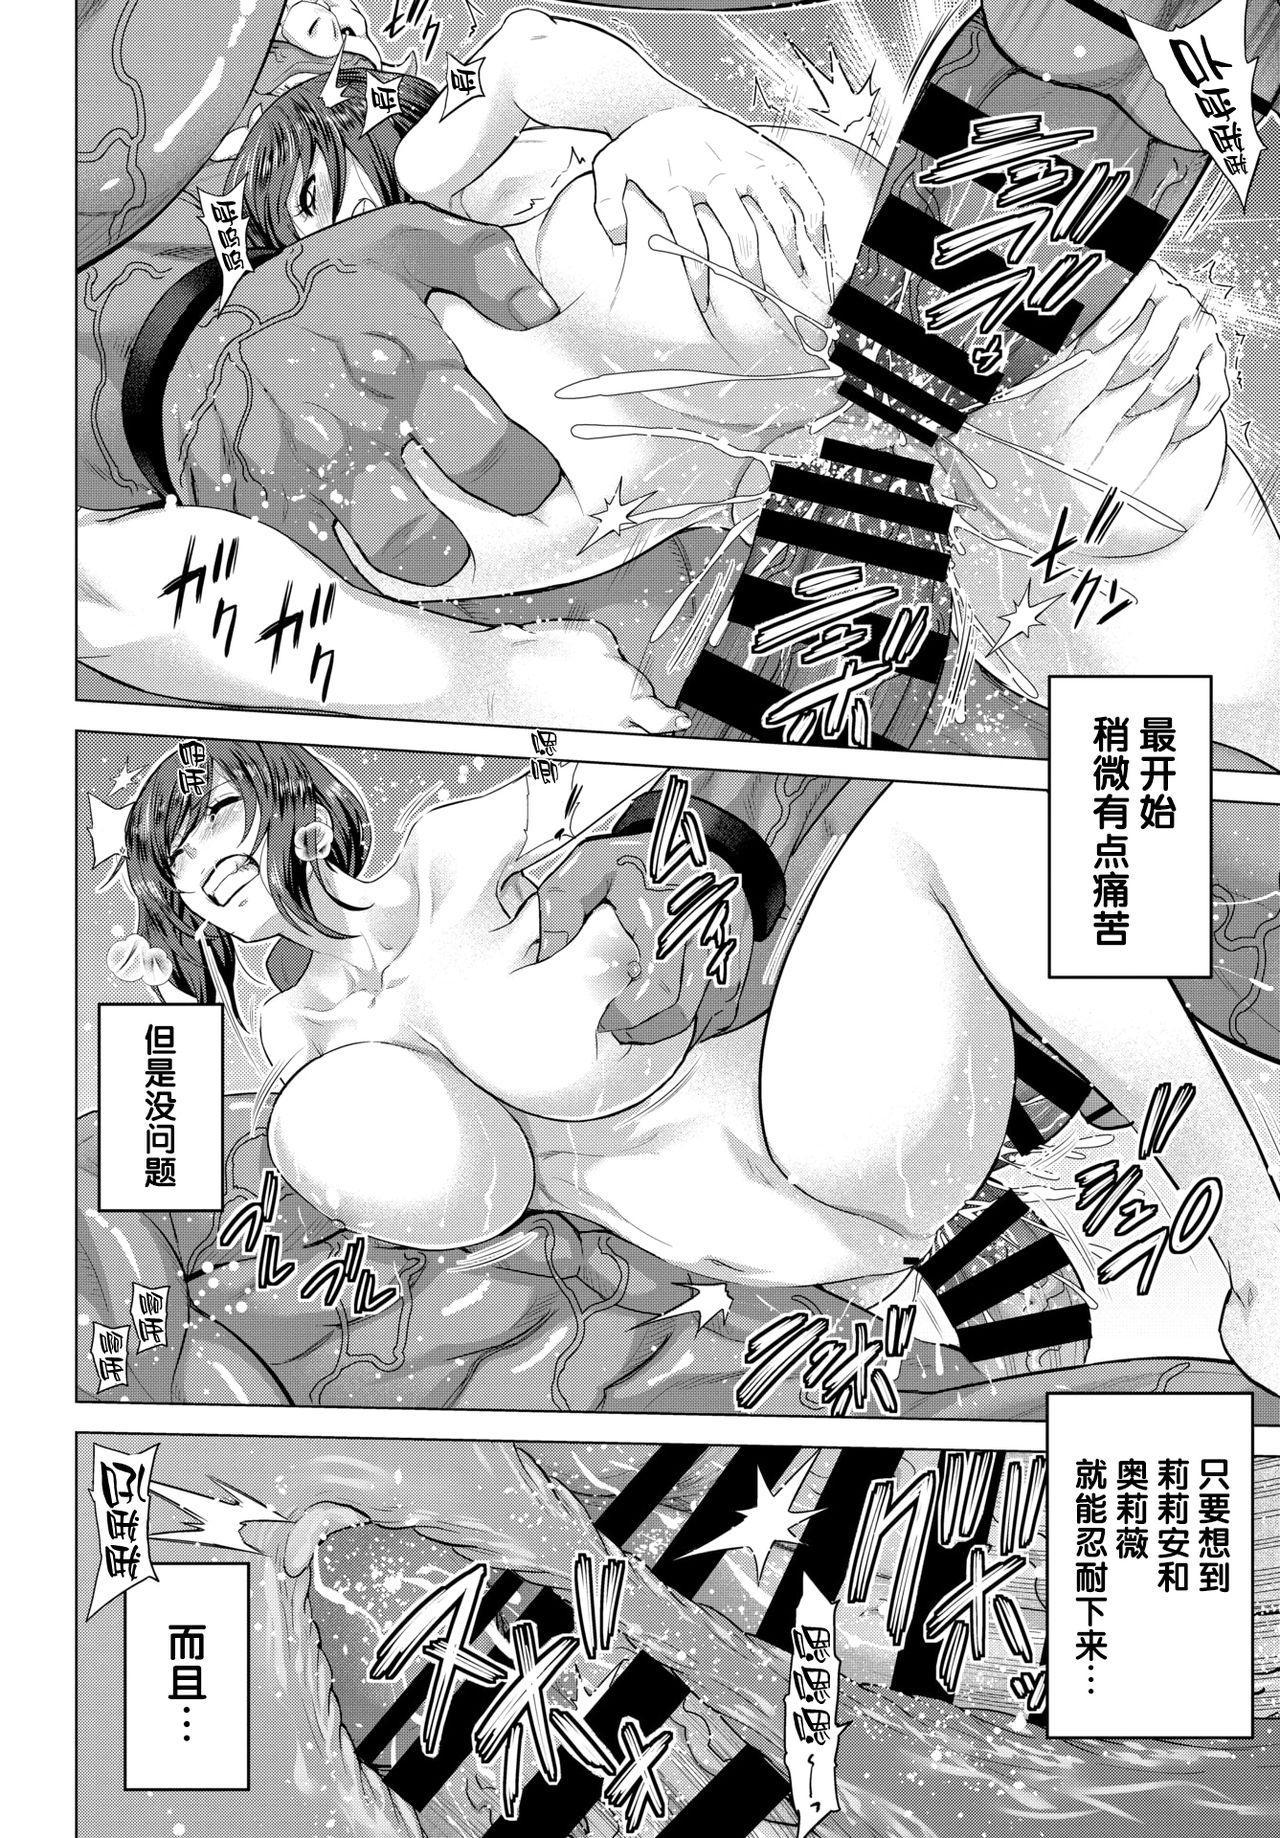 [Yamada Gogogo] Seijo no Rakuin -Annunciation of despair- #05 (COMIC BAVEL 2021-03) [Chinese] [不够色汉化组] [Digital] 14